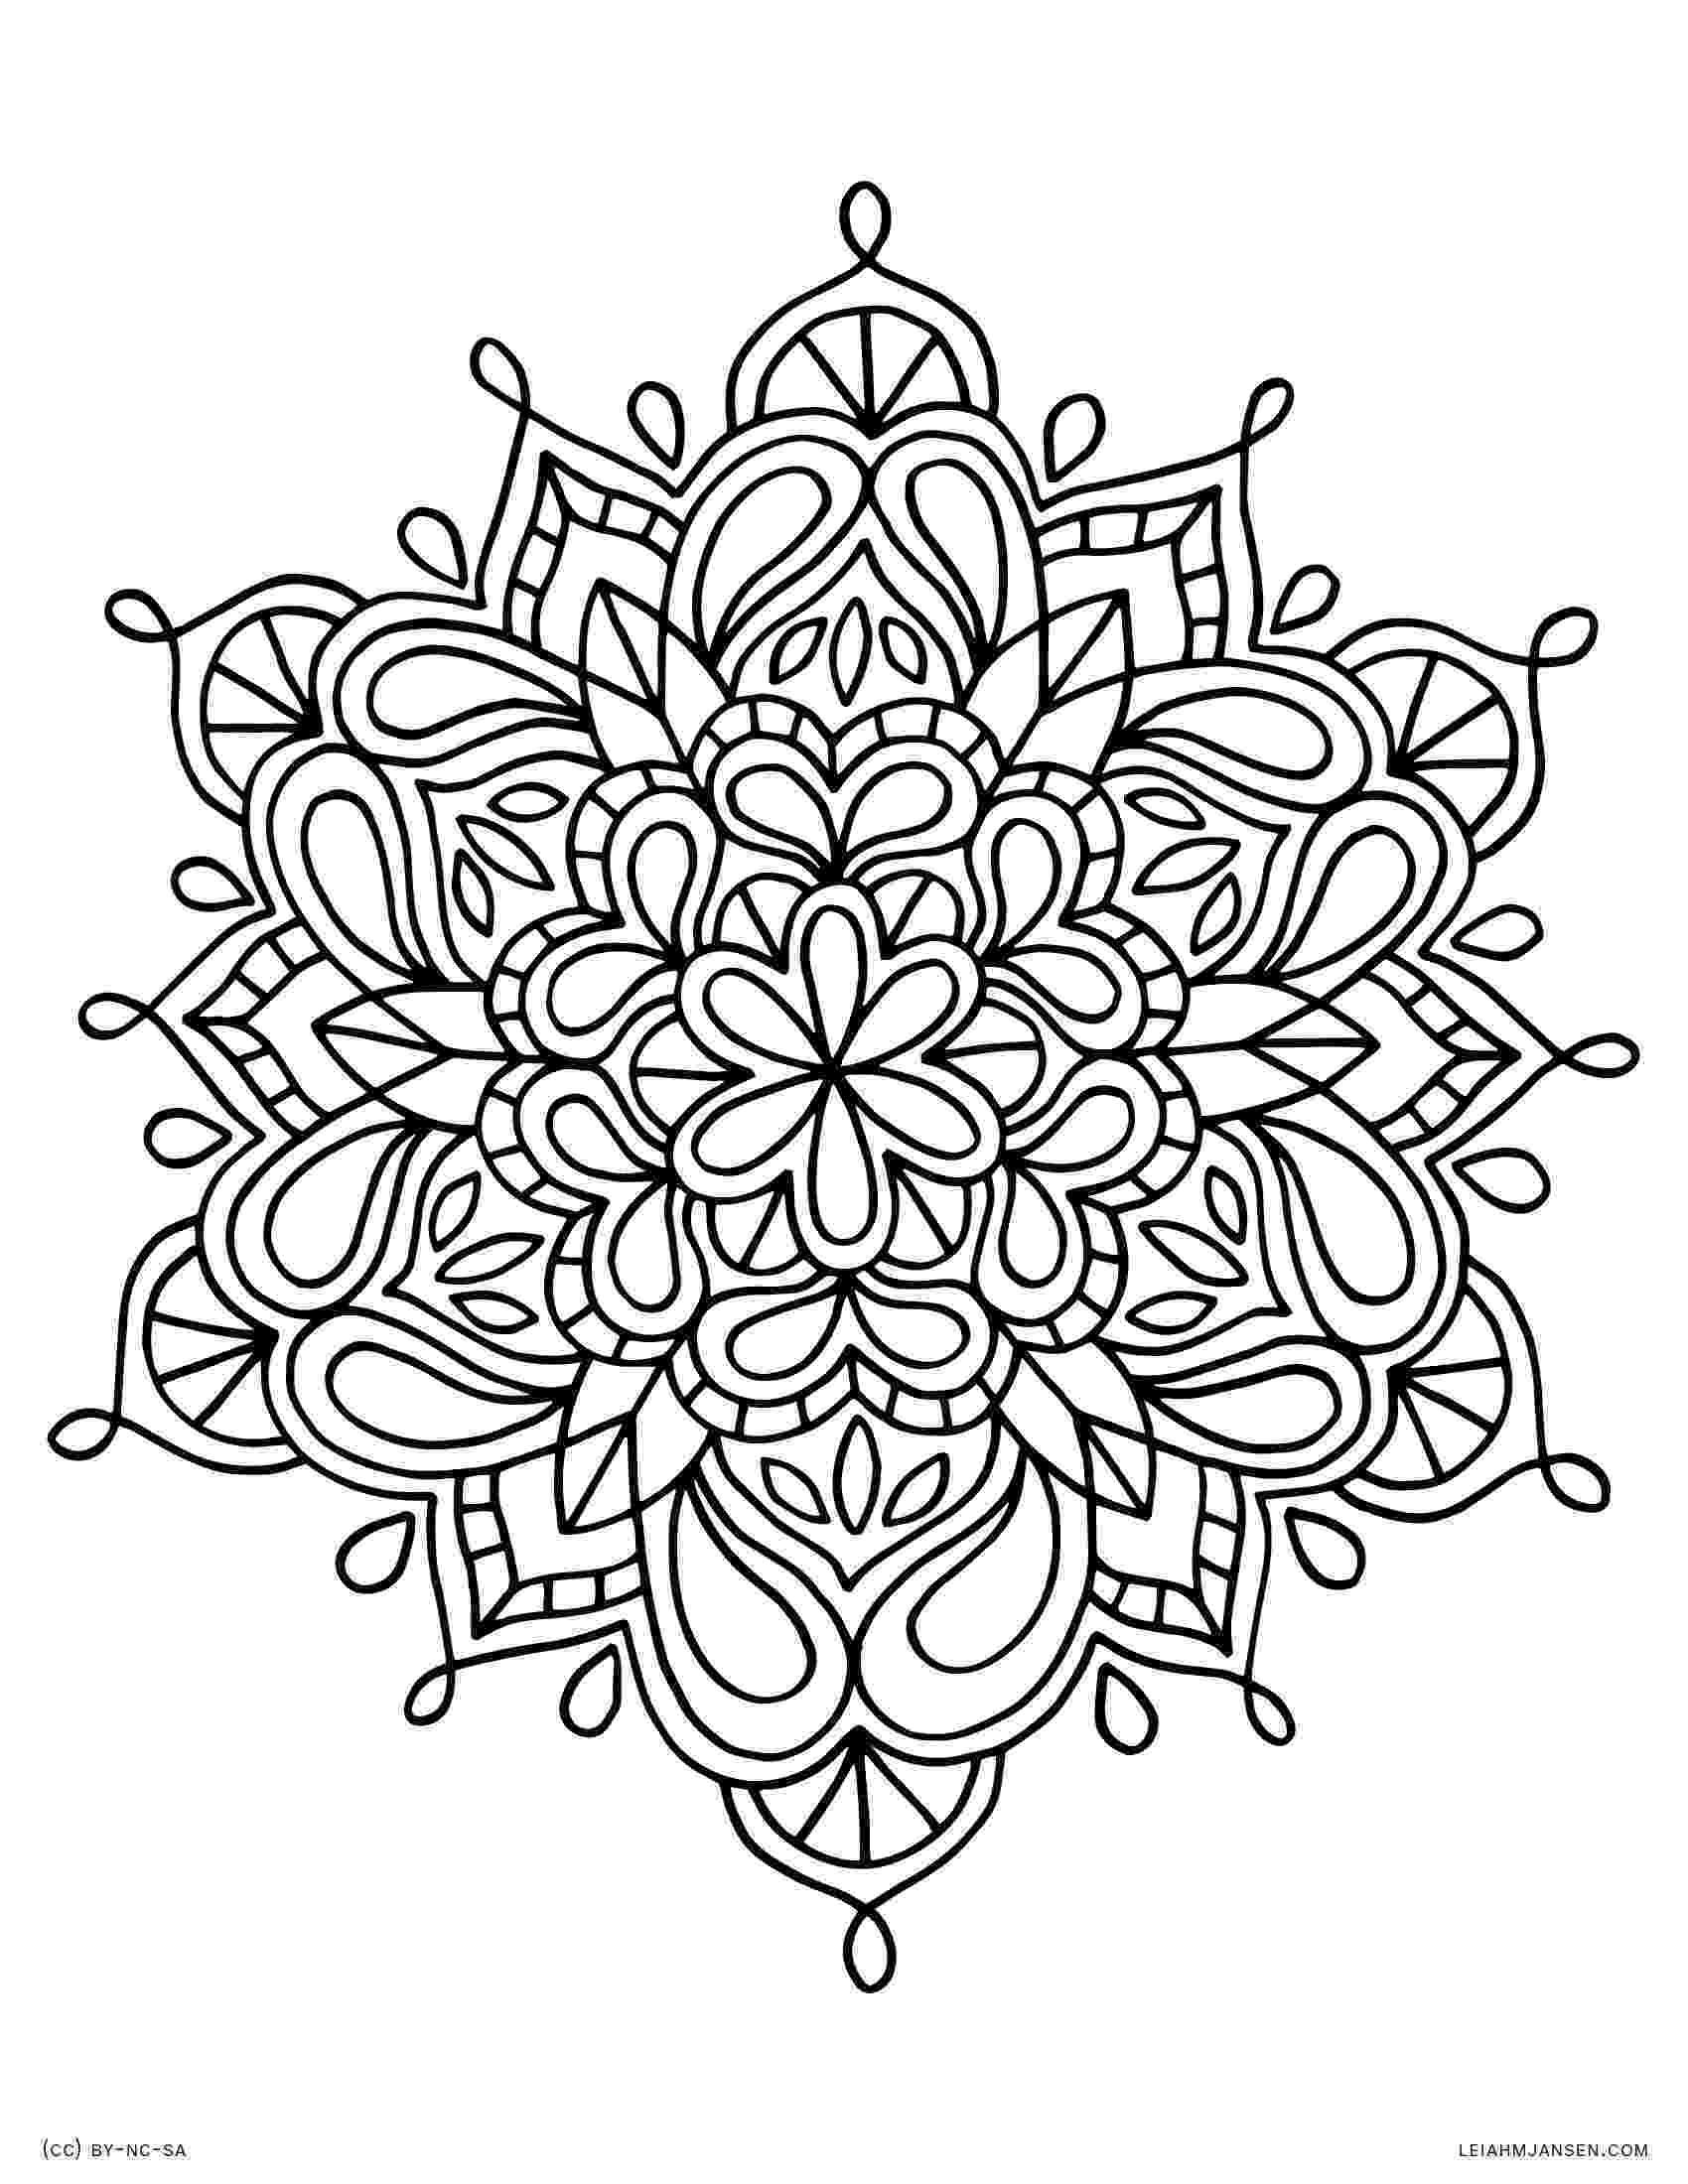 free mandela coloring pages free printable mandala coloring pages for adults pages free mandela coloring